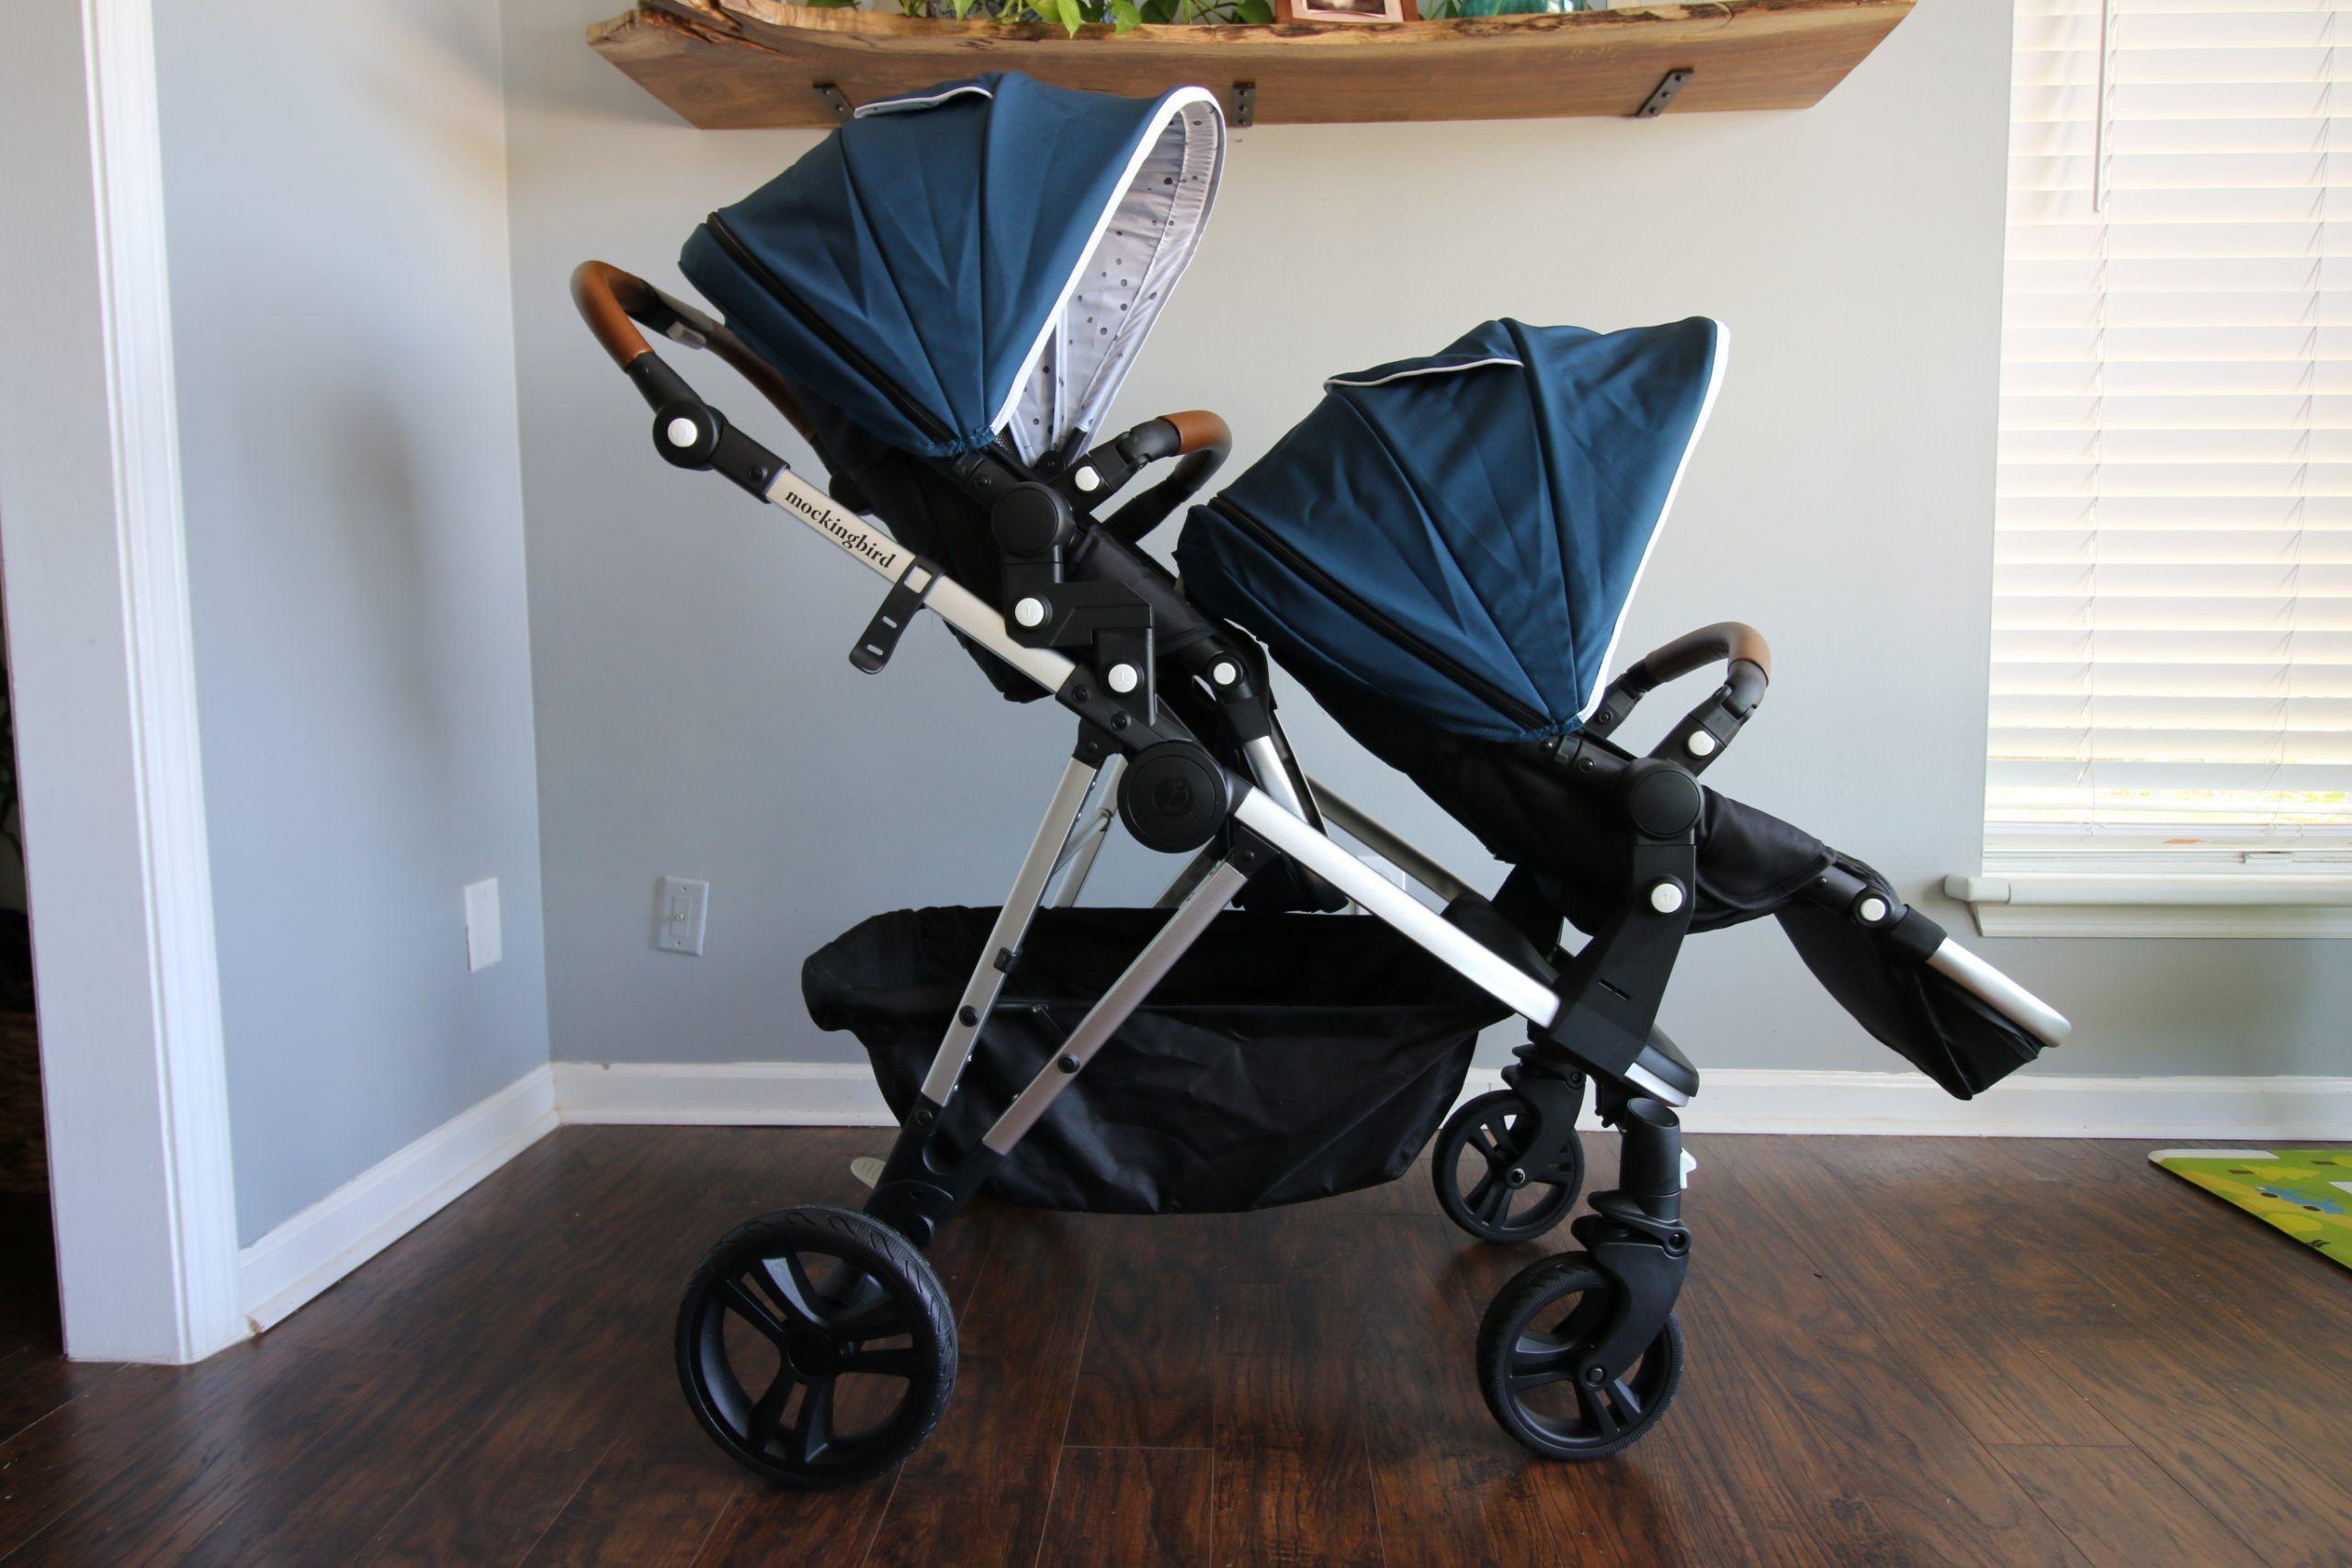 My new favorite stroller the Mockingbird Stroller